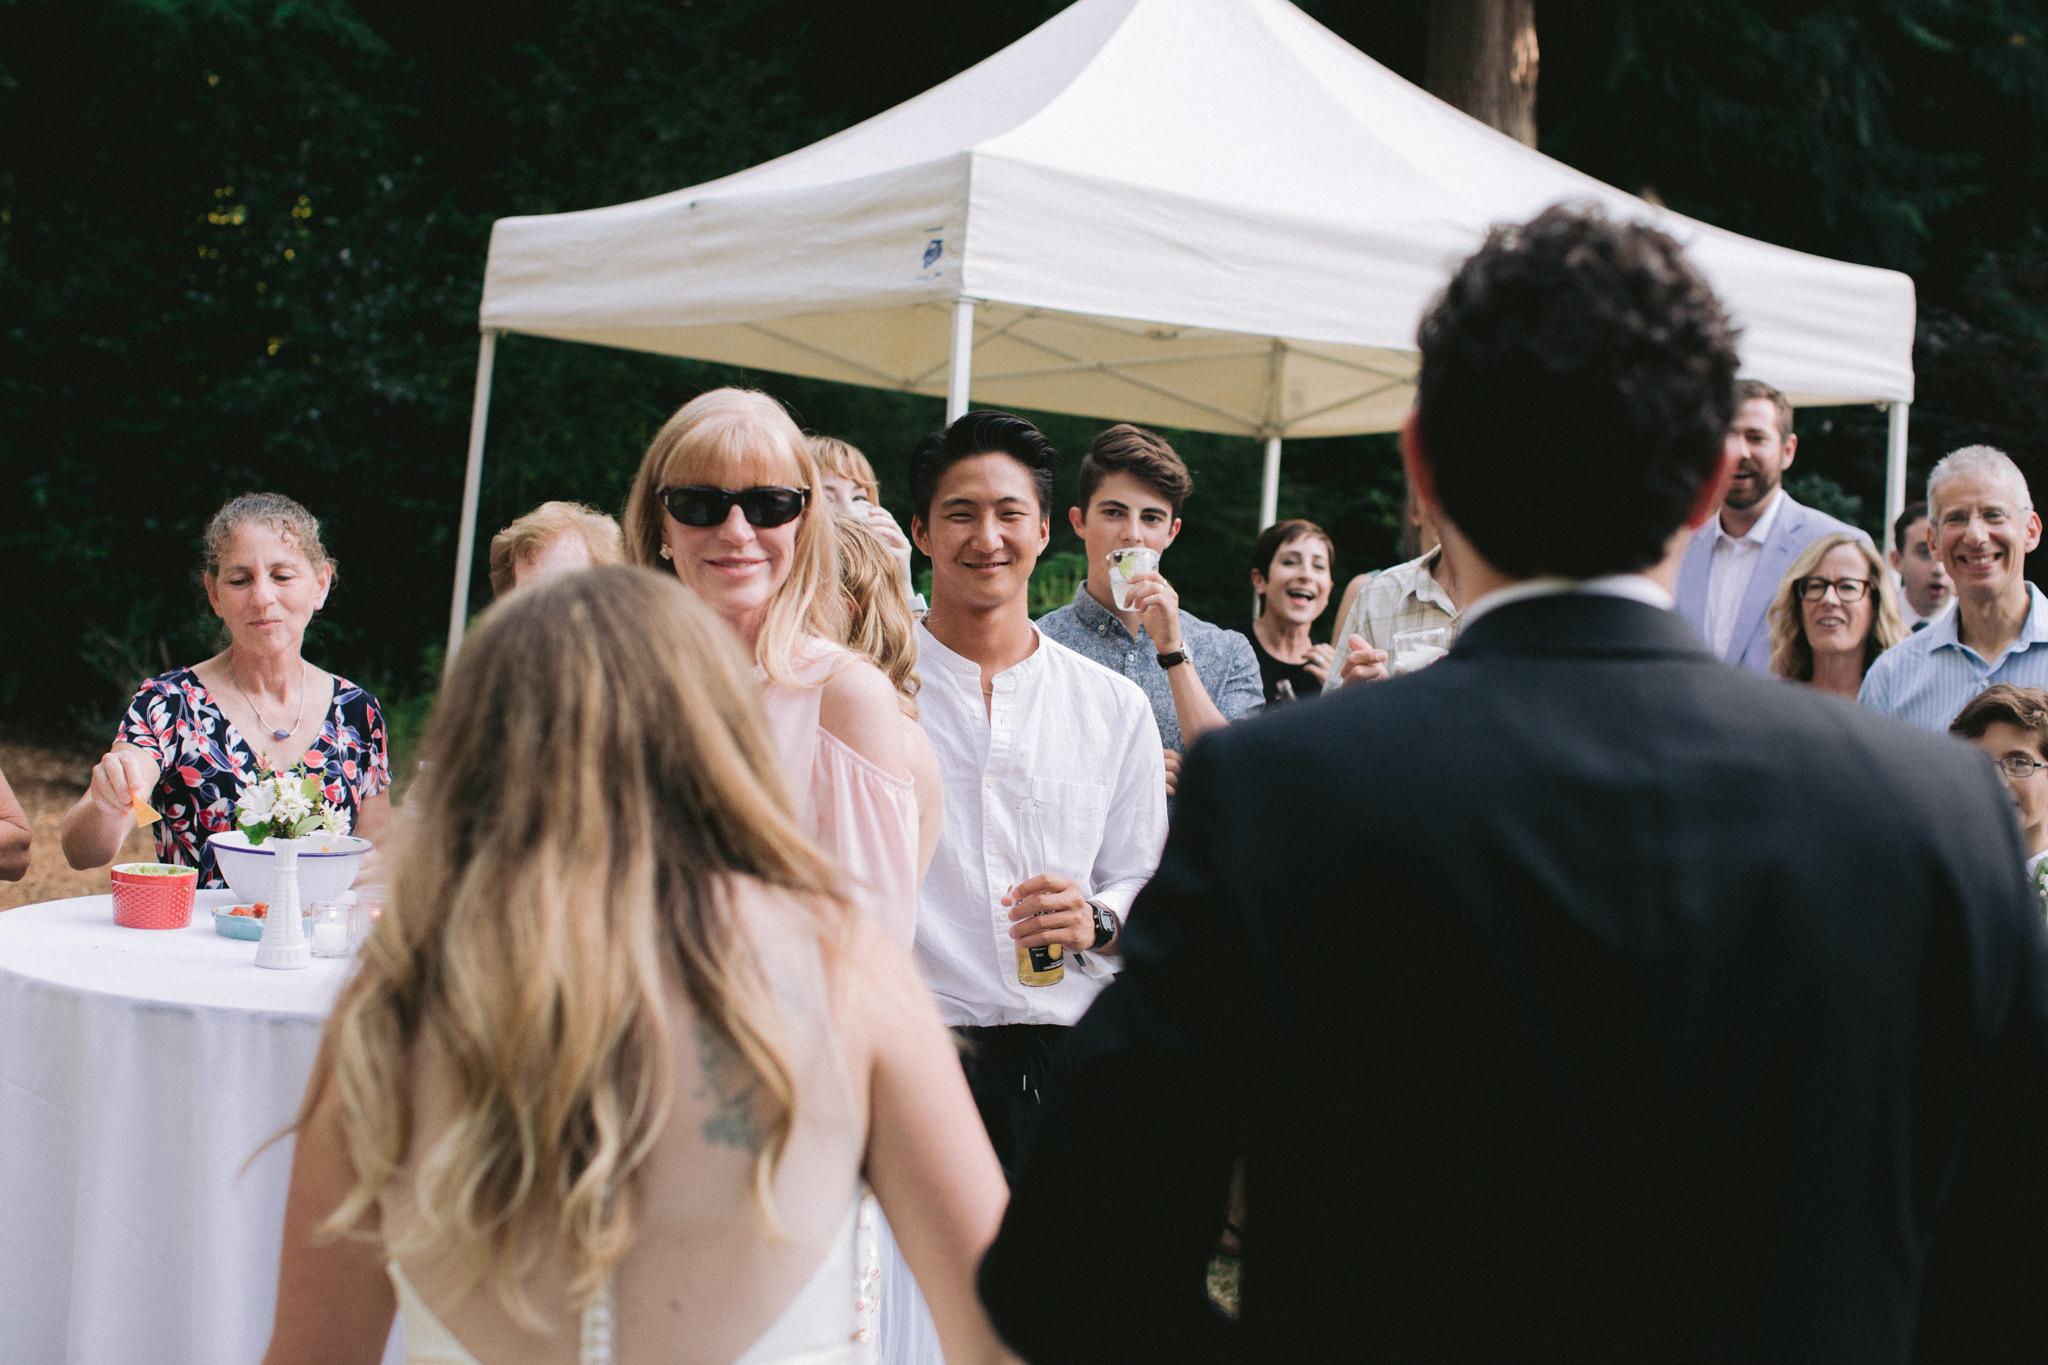 Backyard-Bainbridge-Island-Wedding-Alycia-Lovell-Photography-139.JPG